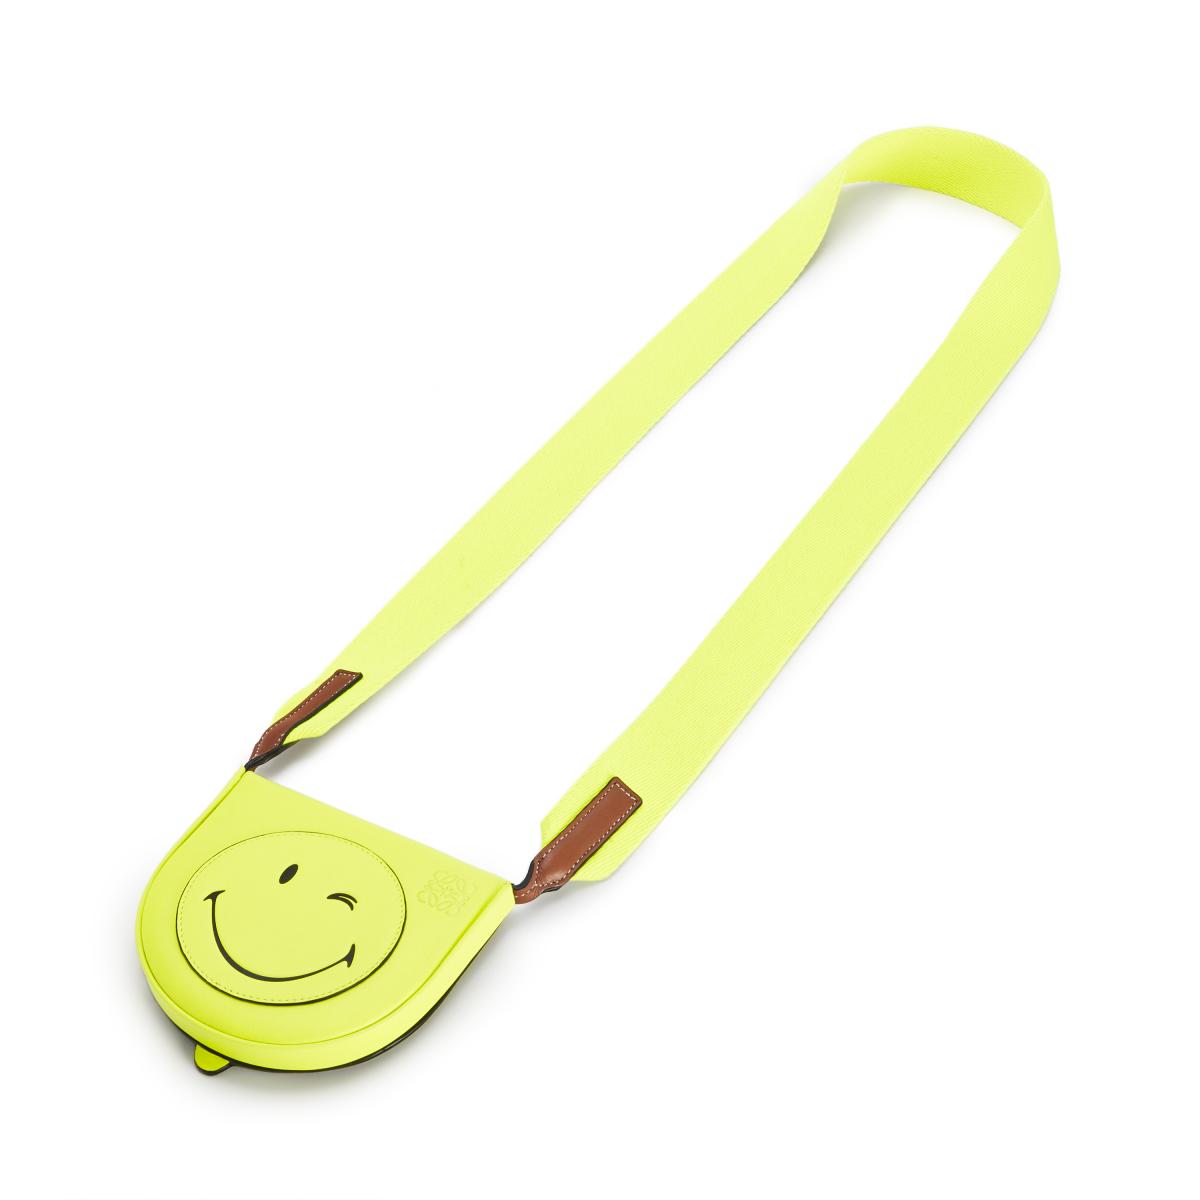 HEEL POUCH SMALL SMILEY WINK(H15×W17.5×D4.5cm)¥68,000 ※日本限定/ロエベ ジャパン クライアントサービス LOEWEPaula's 2020 featuring SmileyWorld®